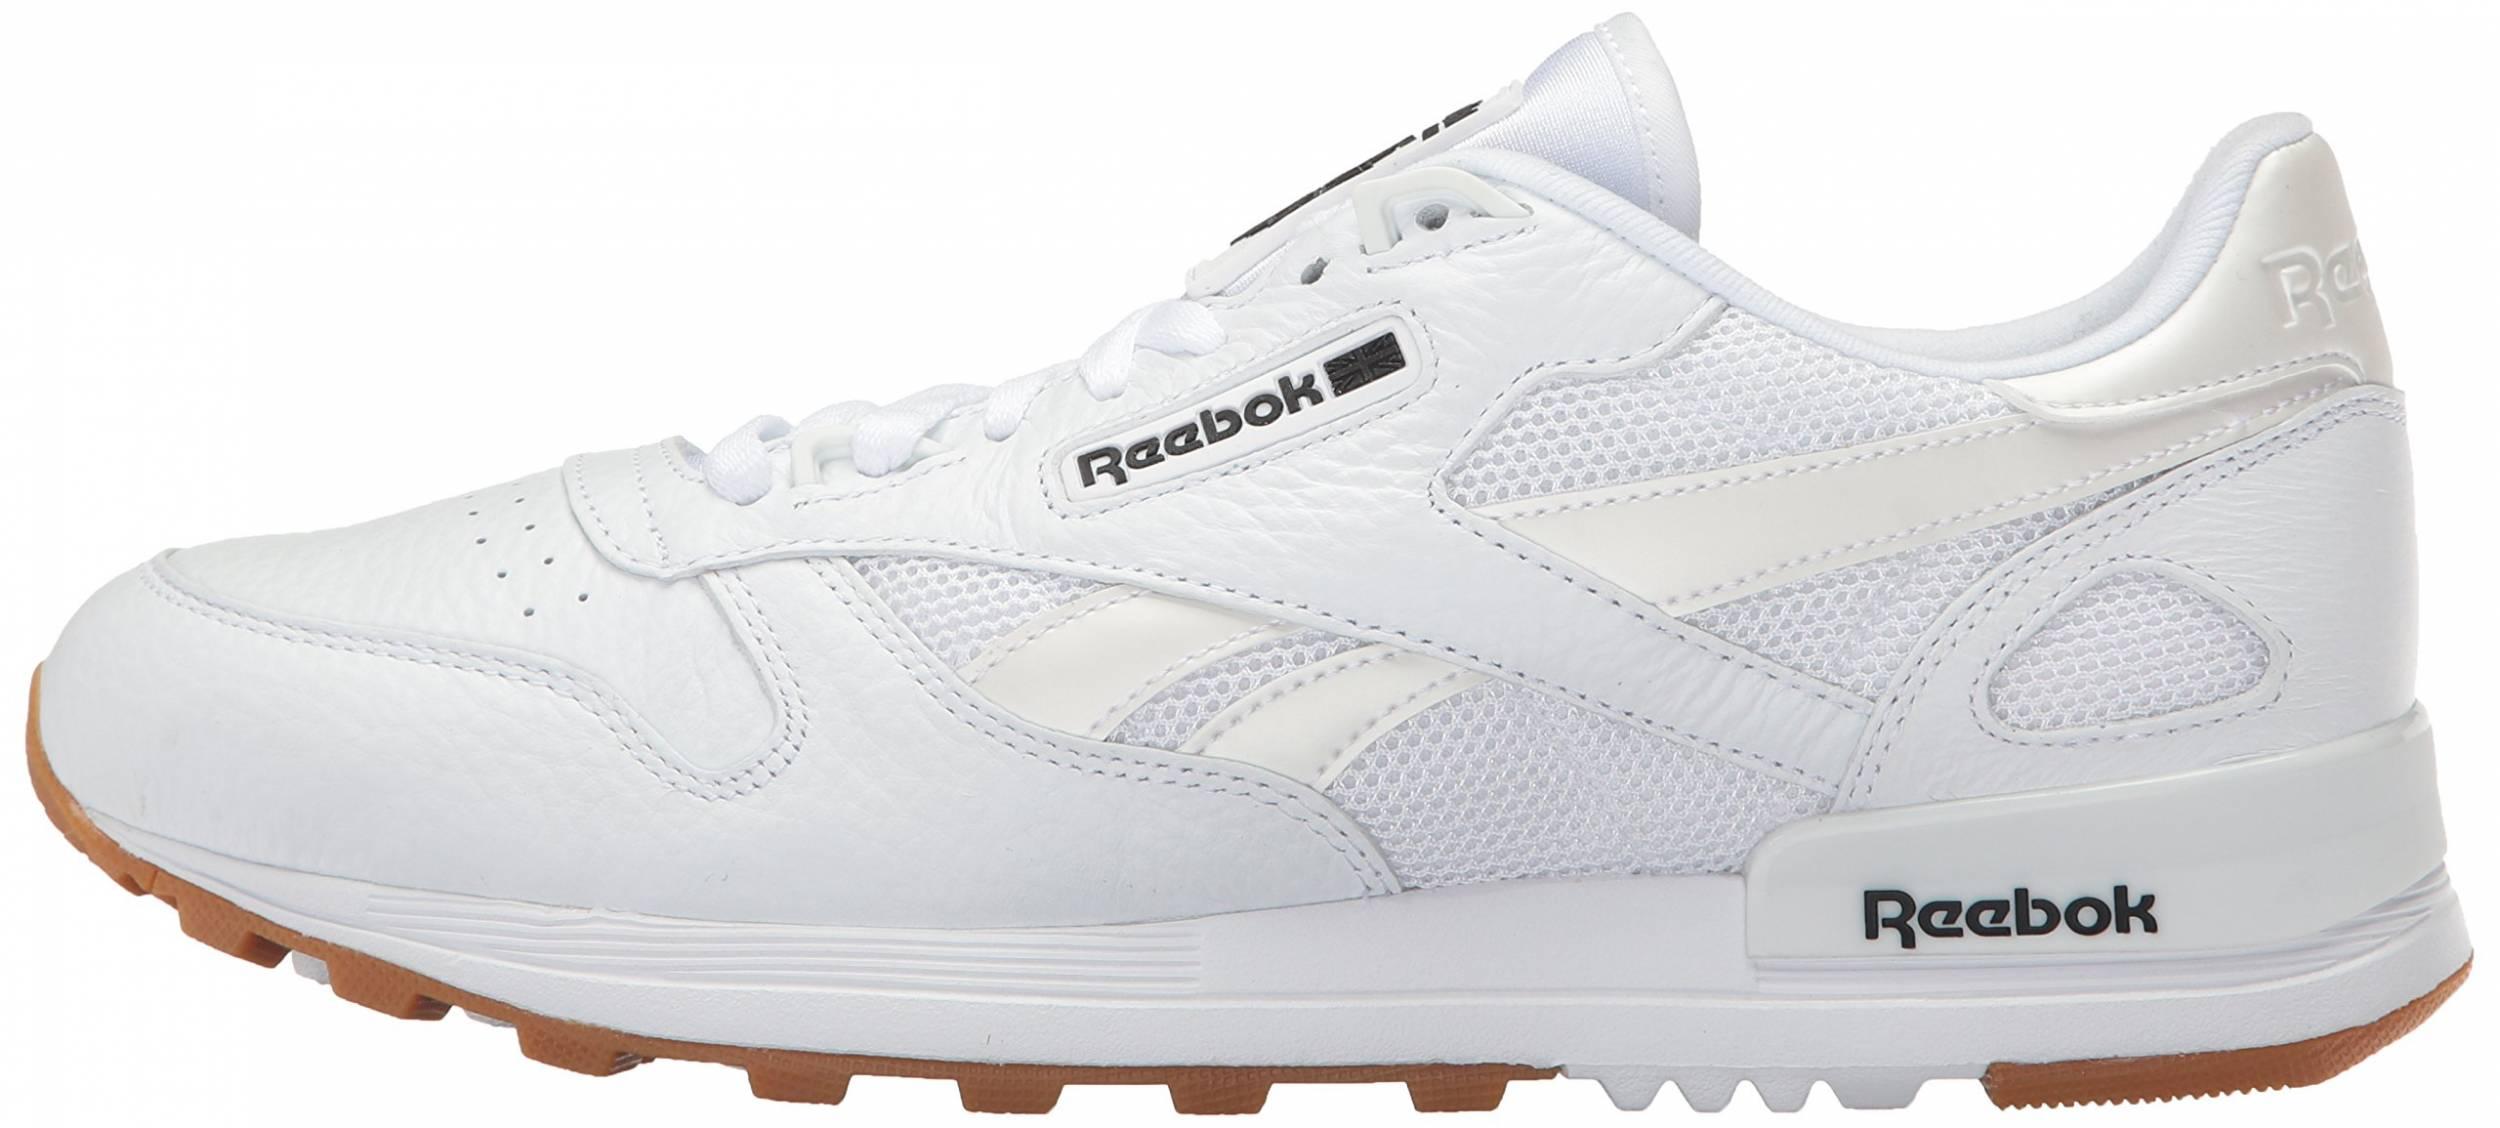 Reebok Classic Leather 2.0